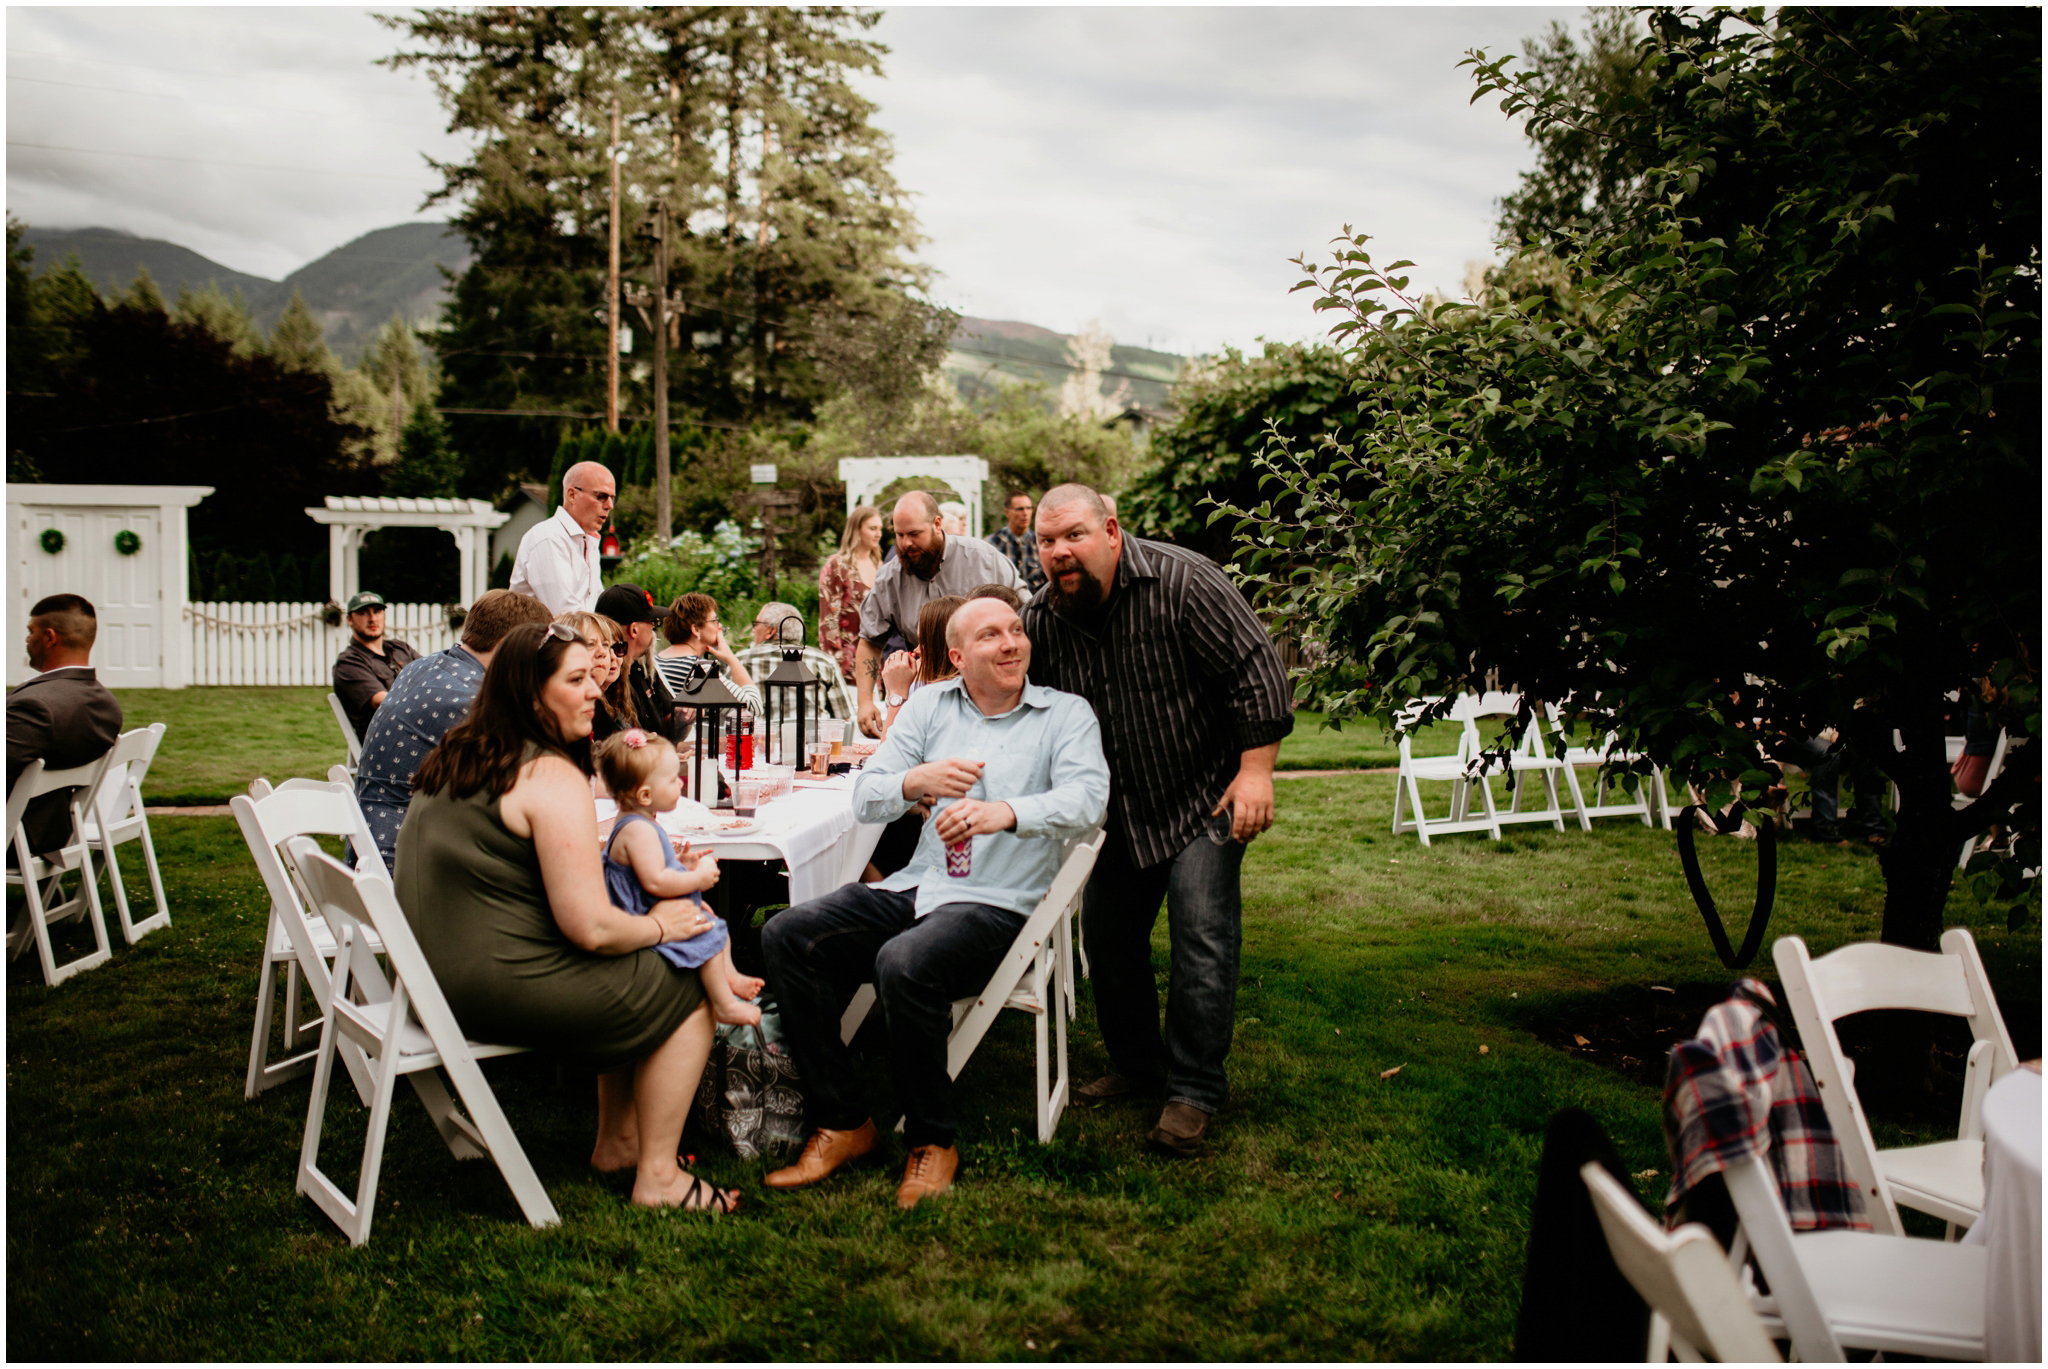 alex-and-matthew-three-cs-farm-venue-seattle-wedding-photographer-151.jpg